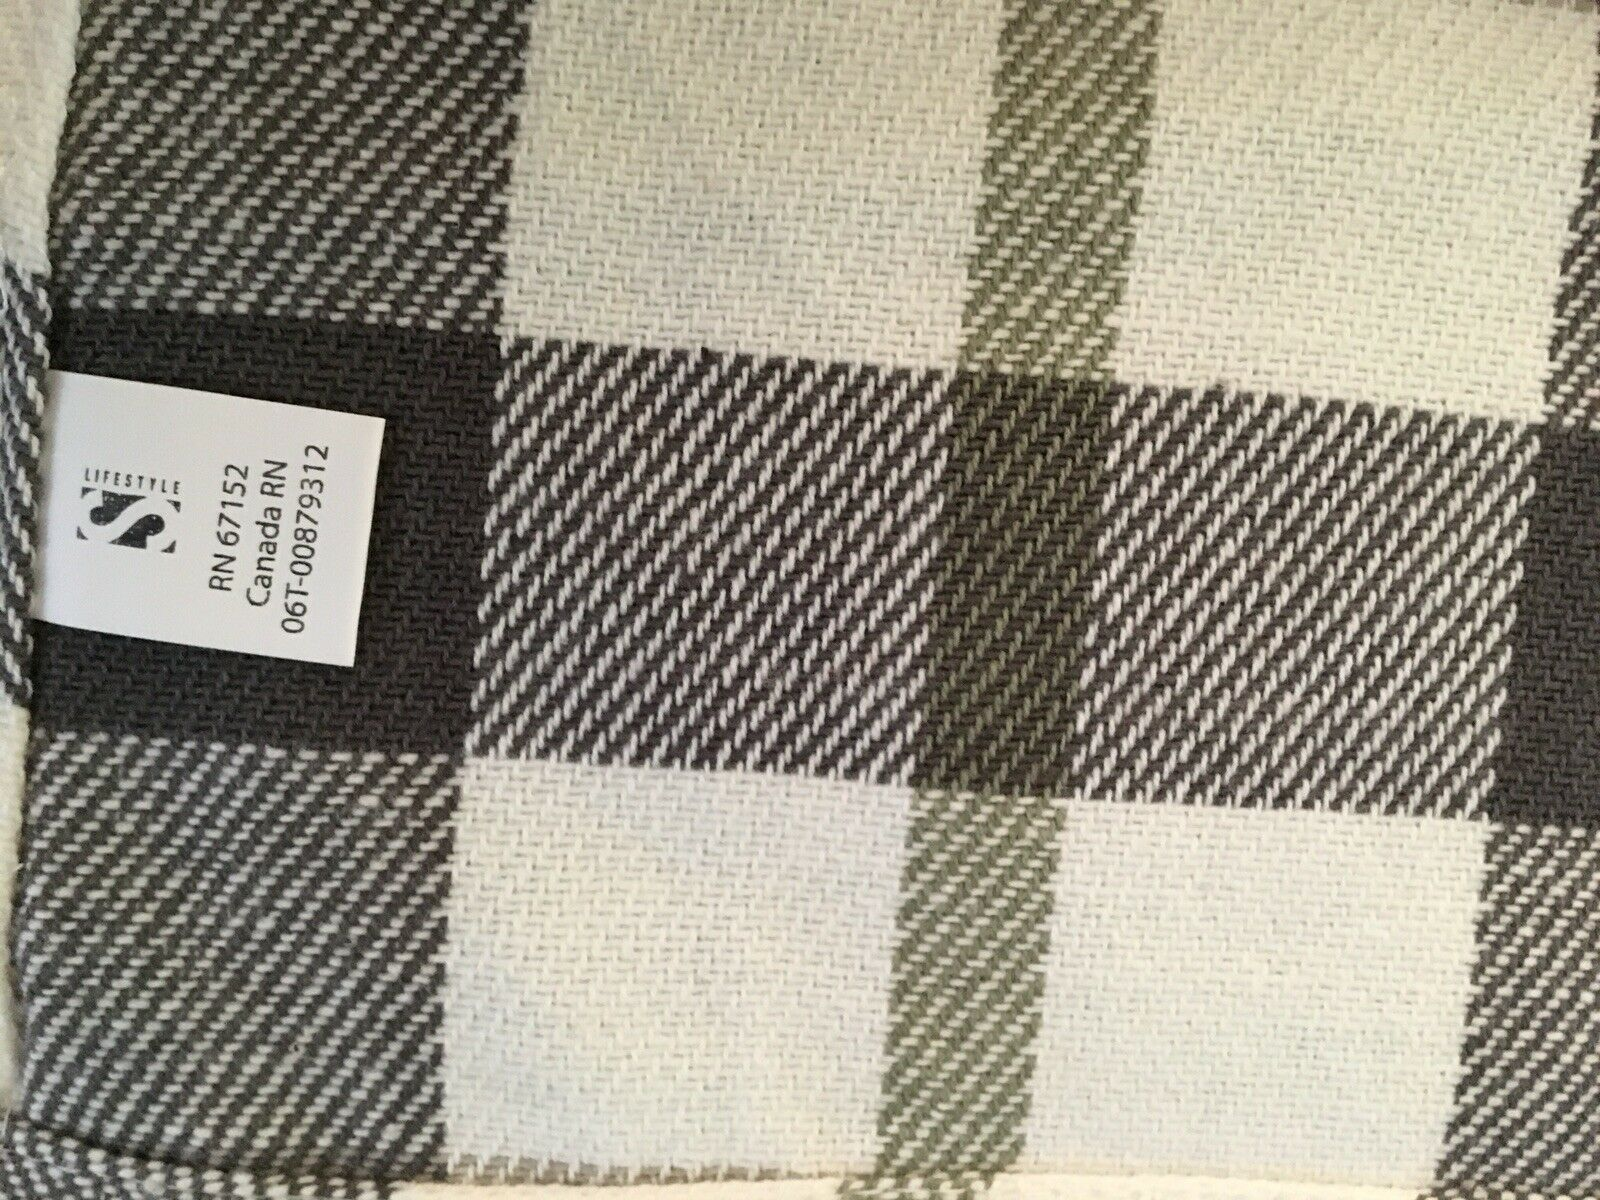 Saro Lifestyle Birmingham Collection Buffalo Plaid Cotton Curtains 54 X 96 Red 9025 R5496 Kitchen Dining Home Kitchen